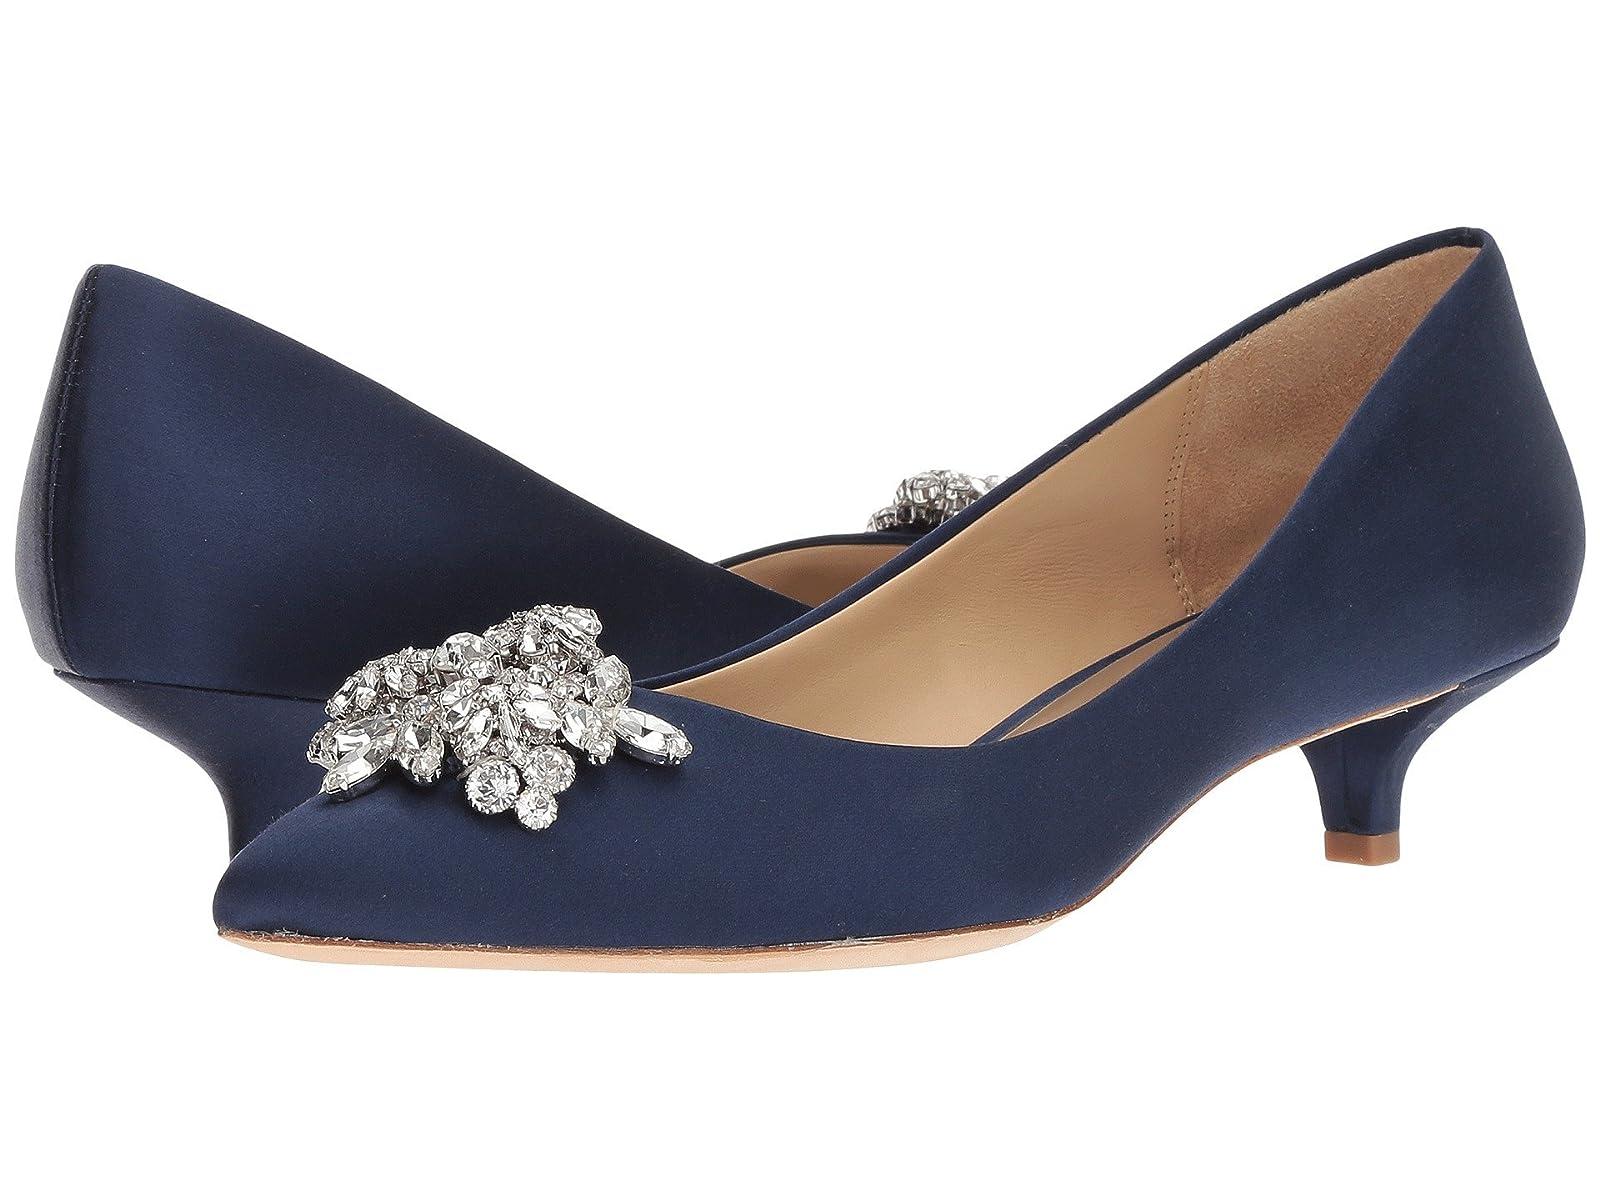 Badgley Mischka VailAtmospheric grades have affordable shoes